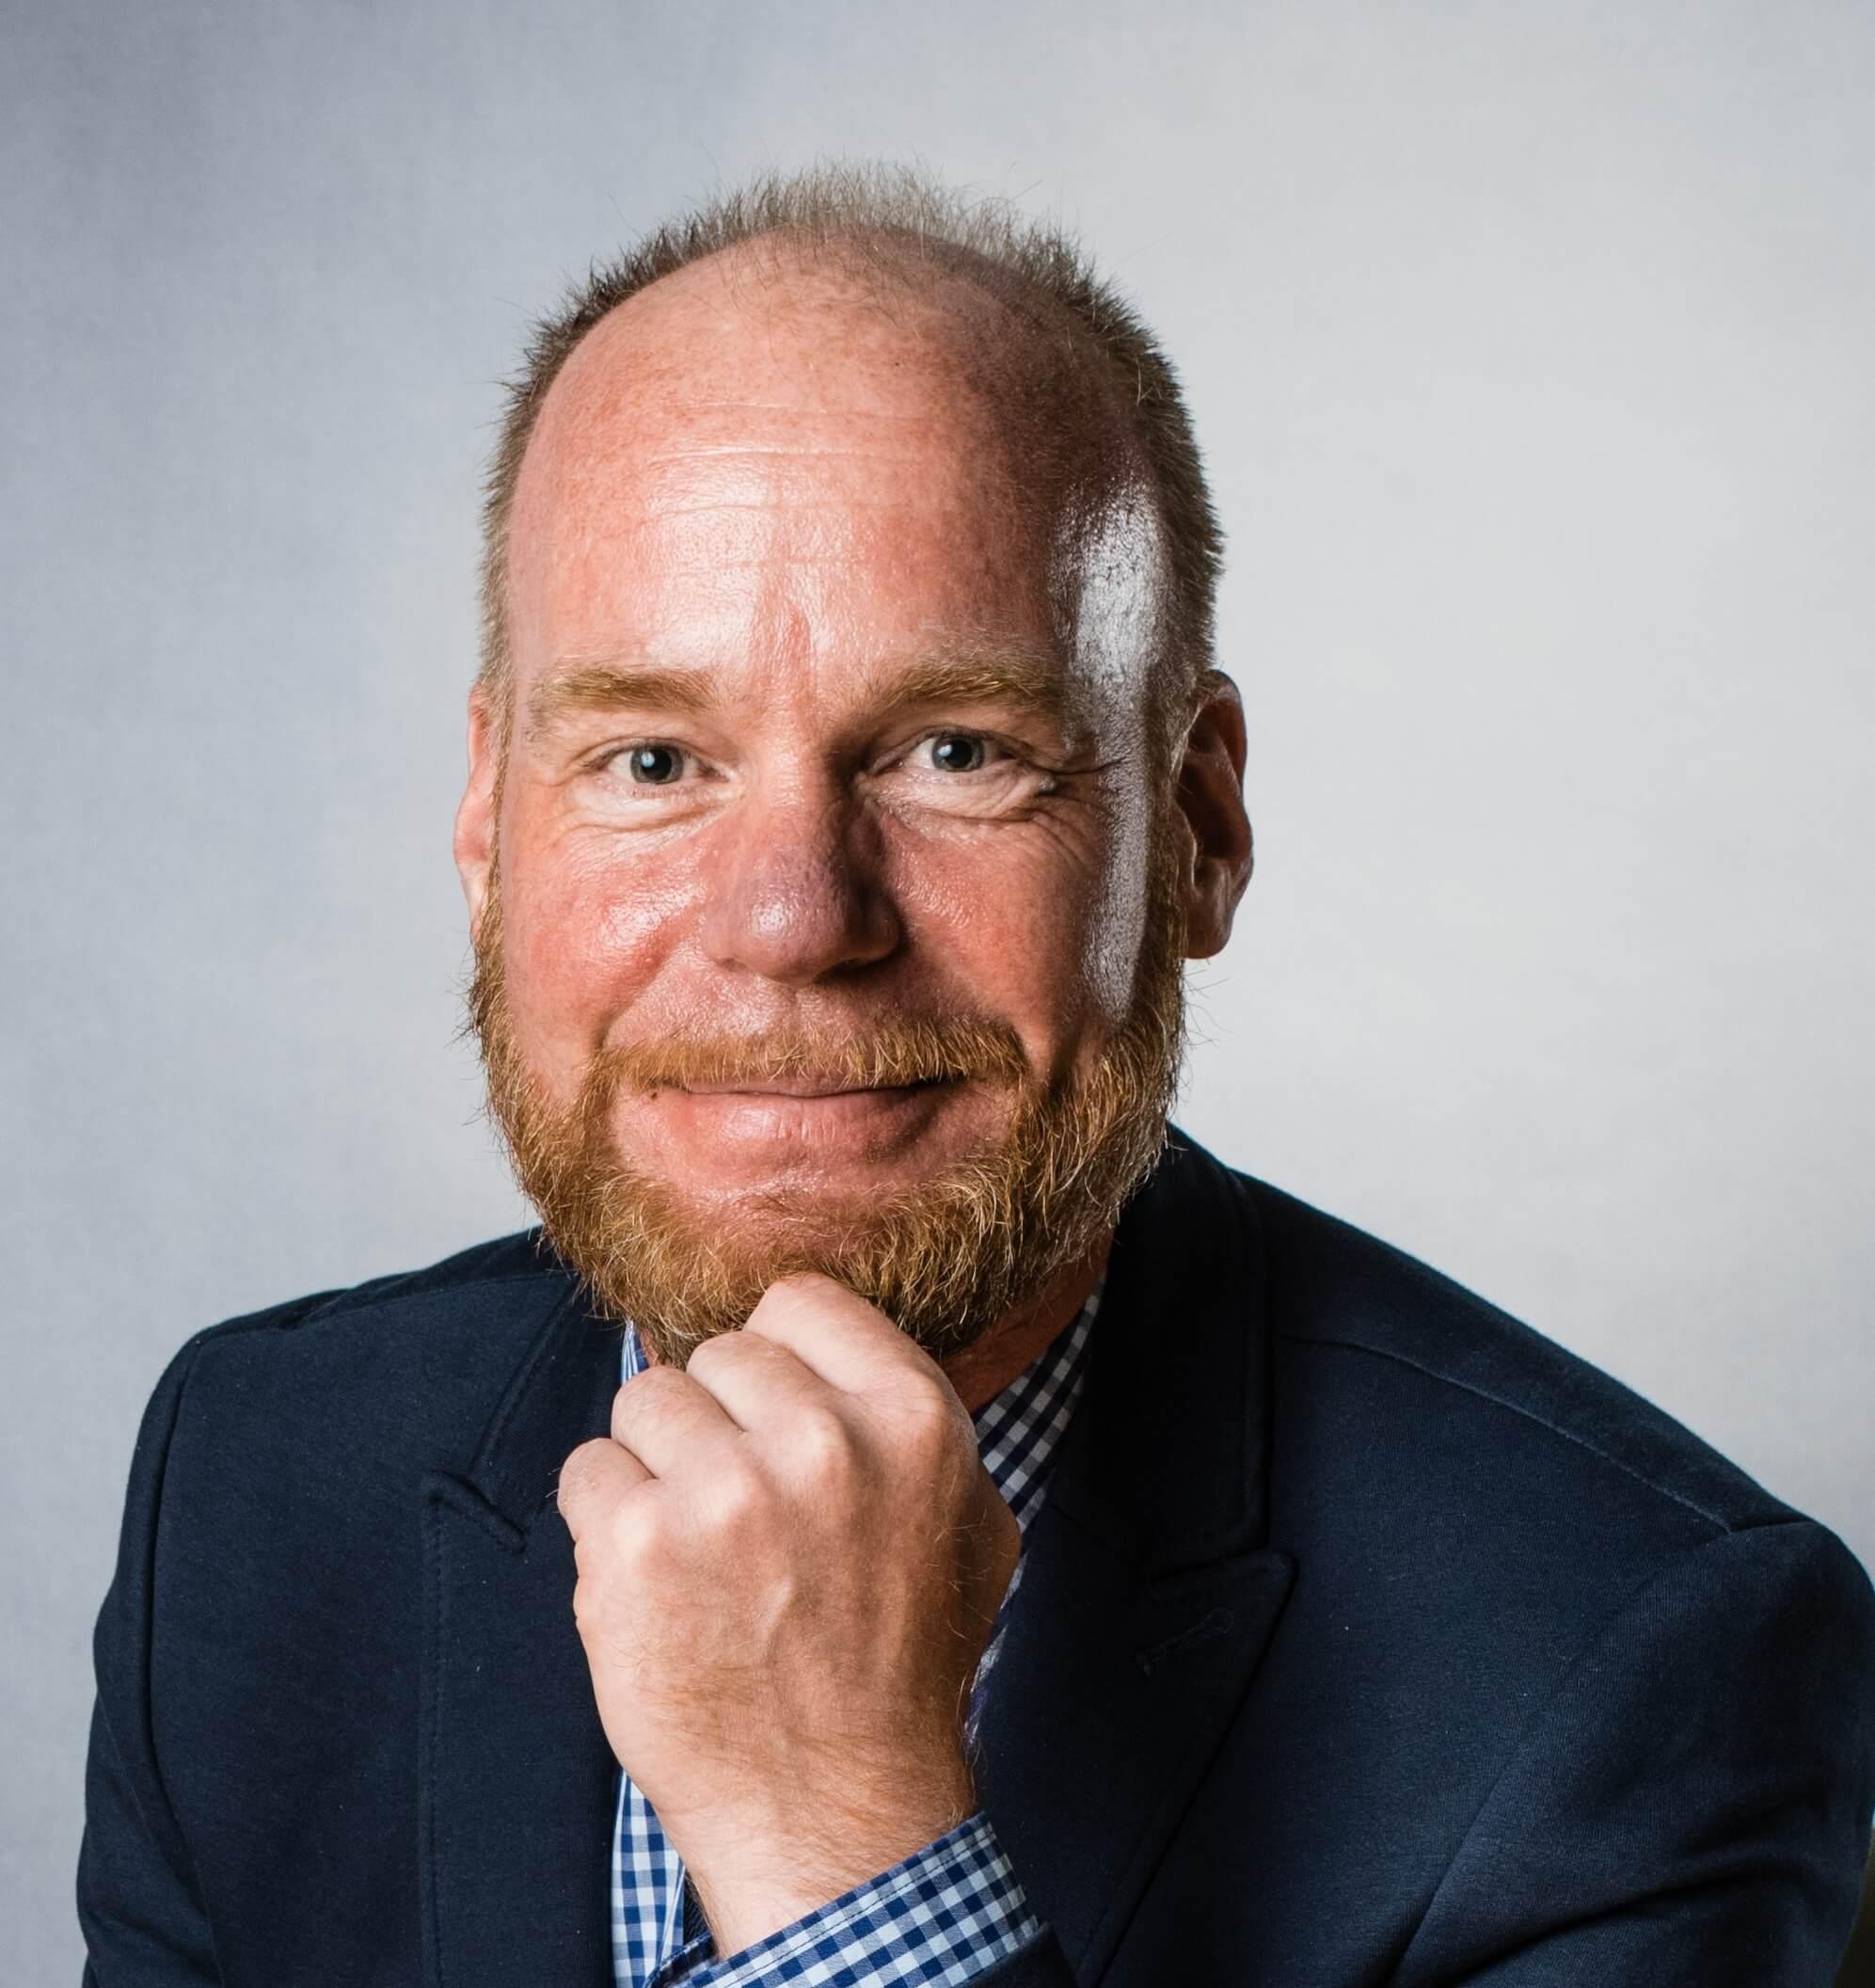 Klaus-Peter Jansen